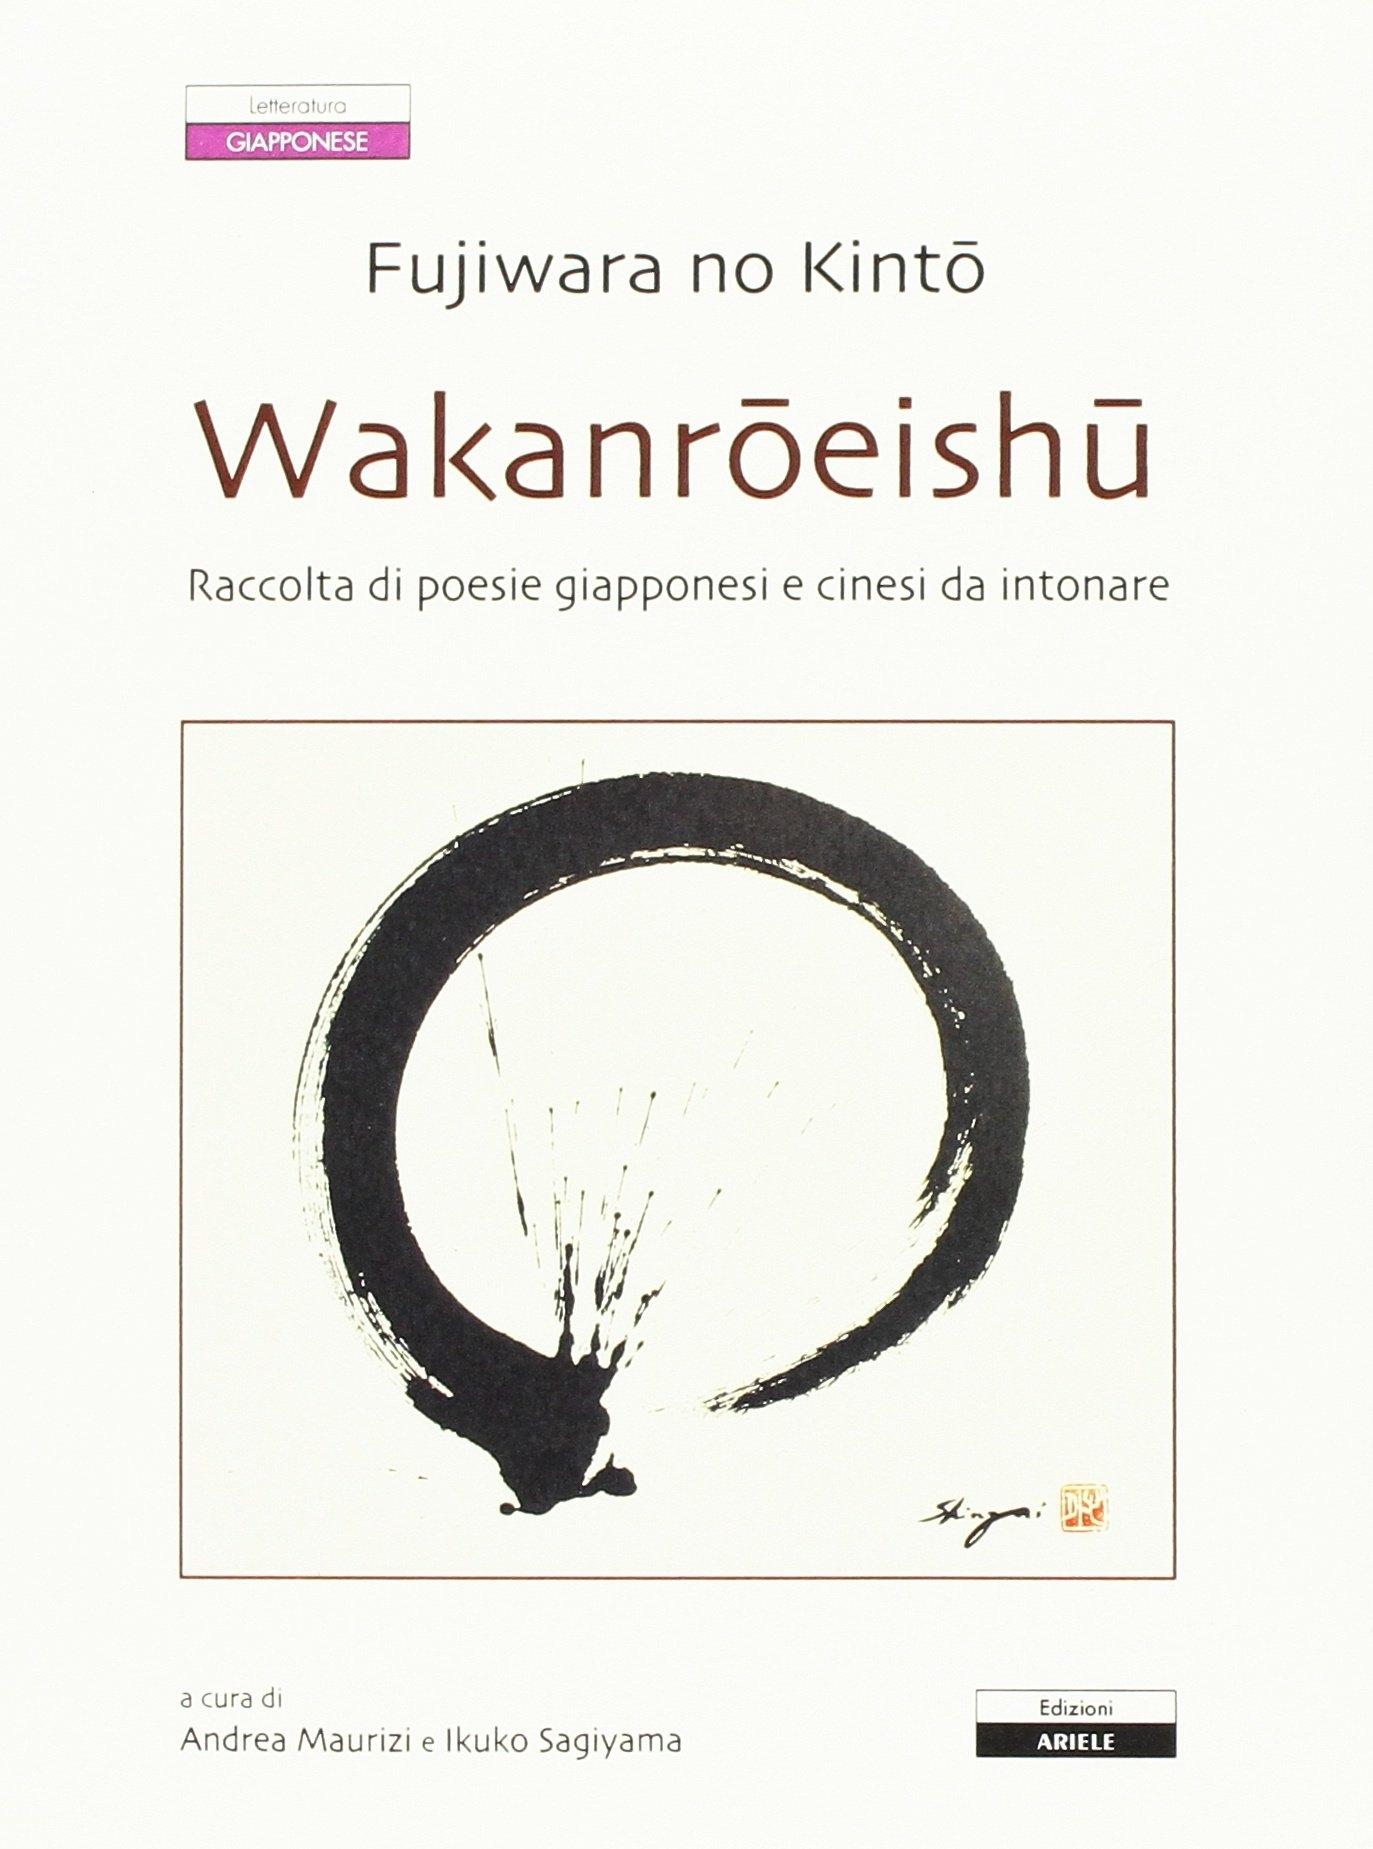 Wakenroeishu. Raccolta di poesie giapponesi e cinesi da intonare.